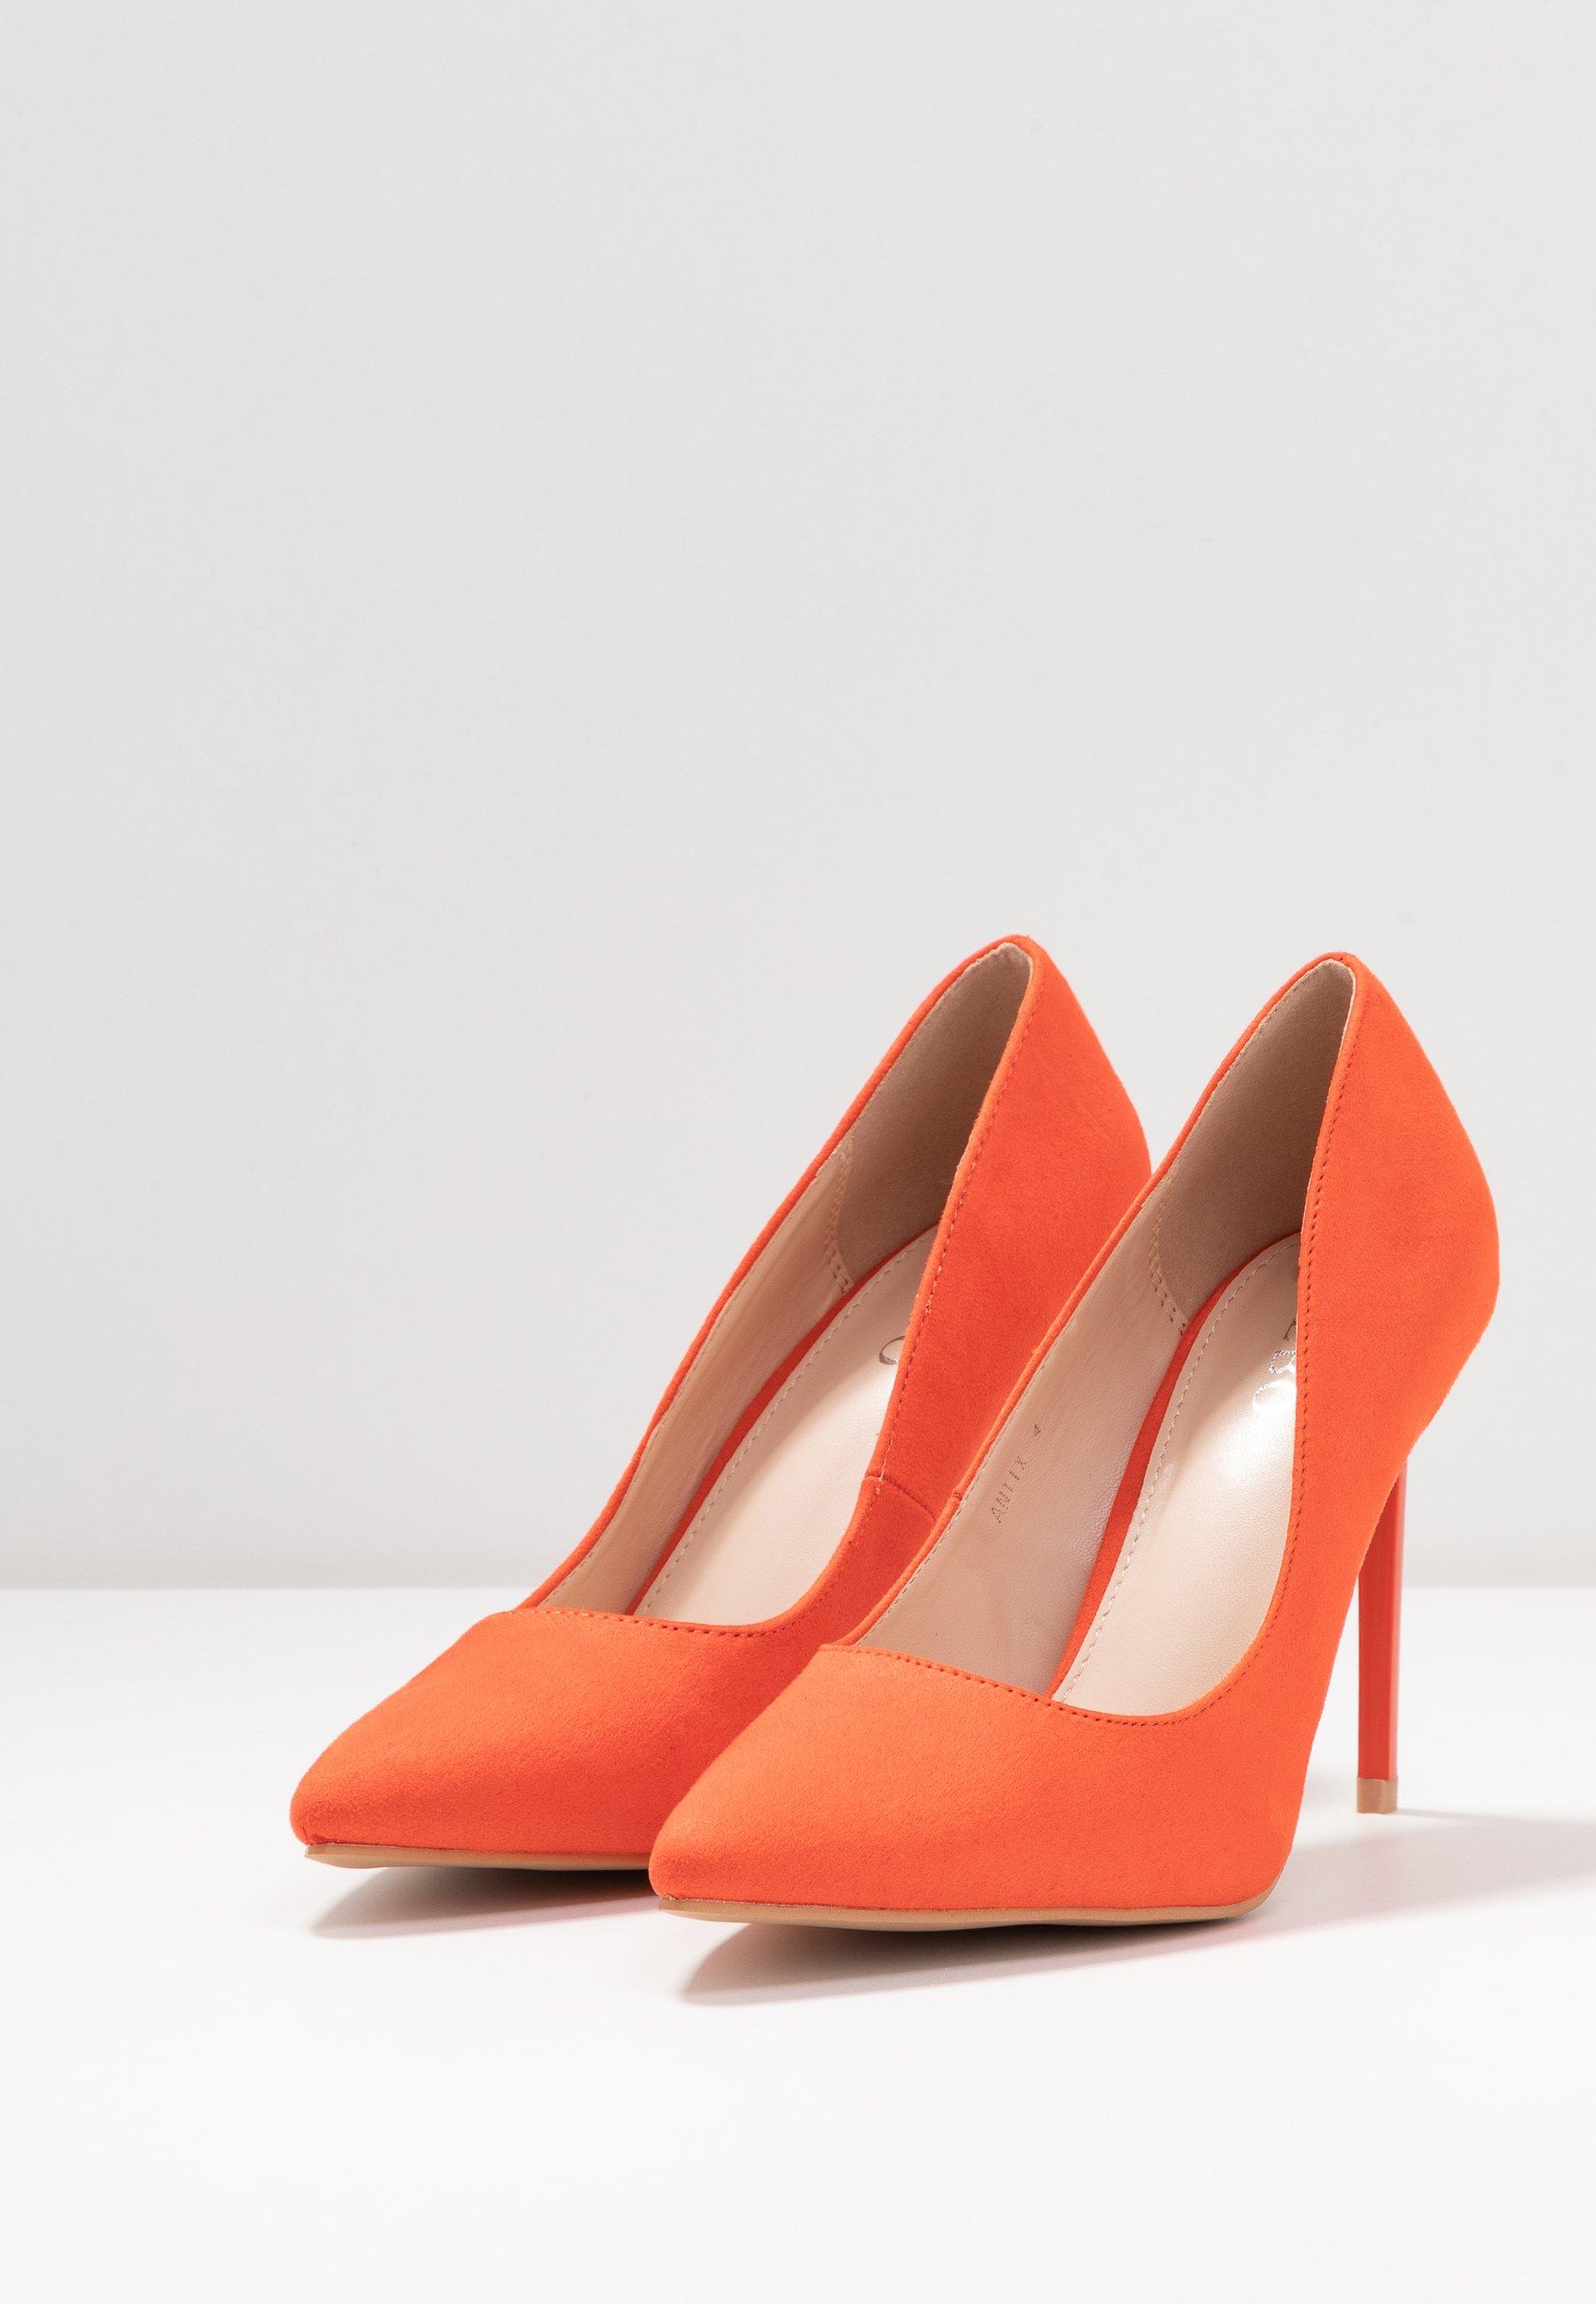 Bebo Antix - Hoge Hakken Orange Goedkope Schoenen